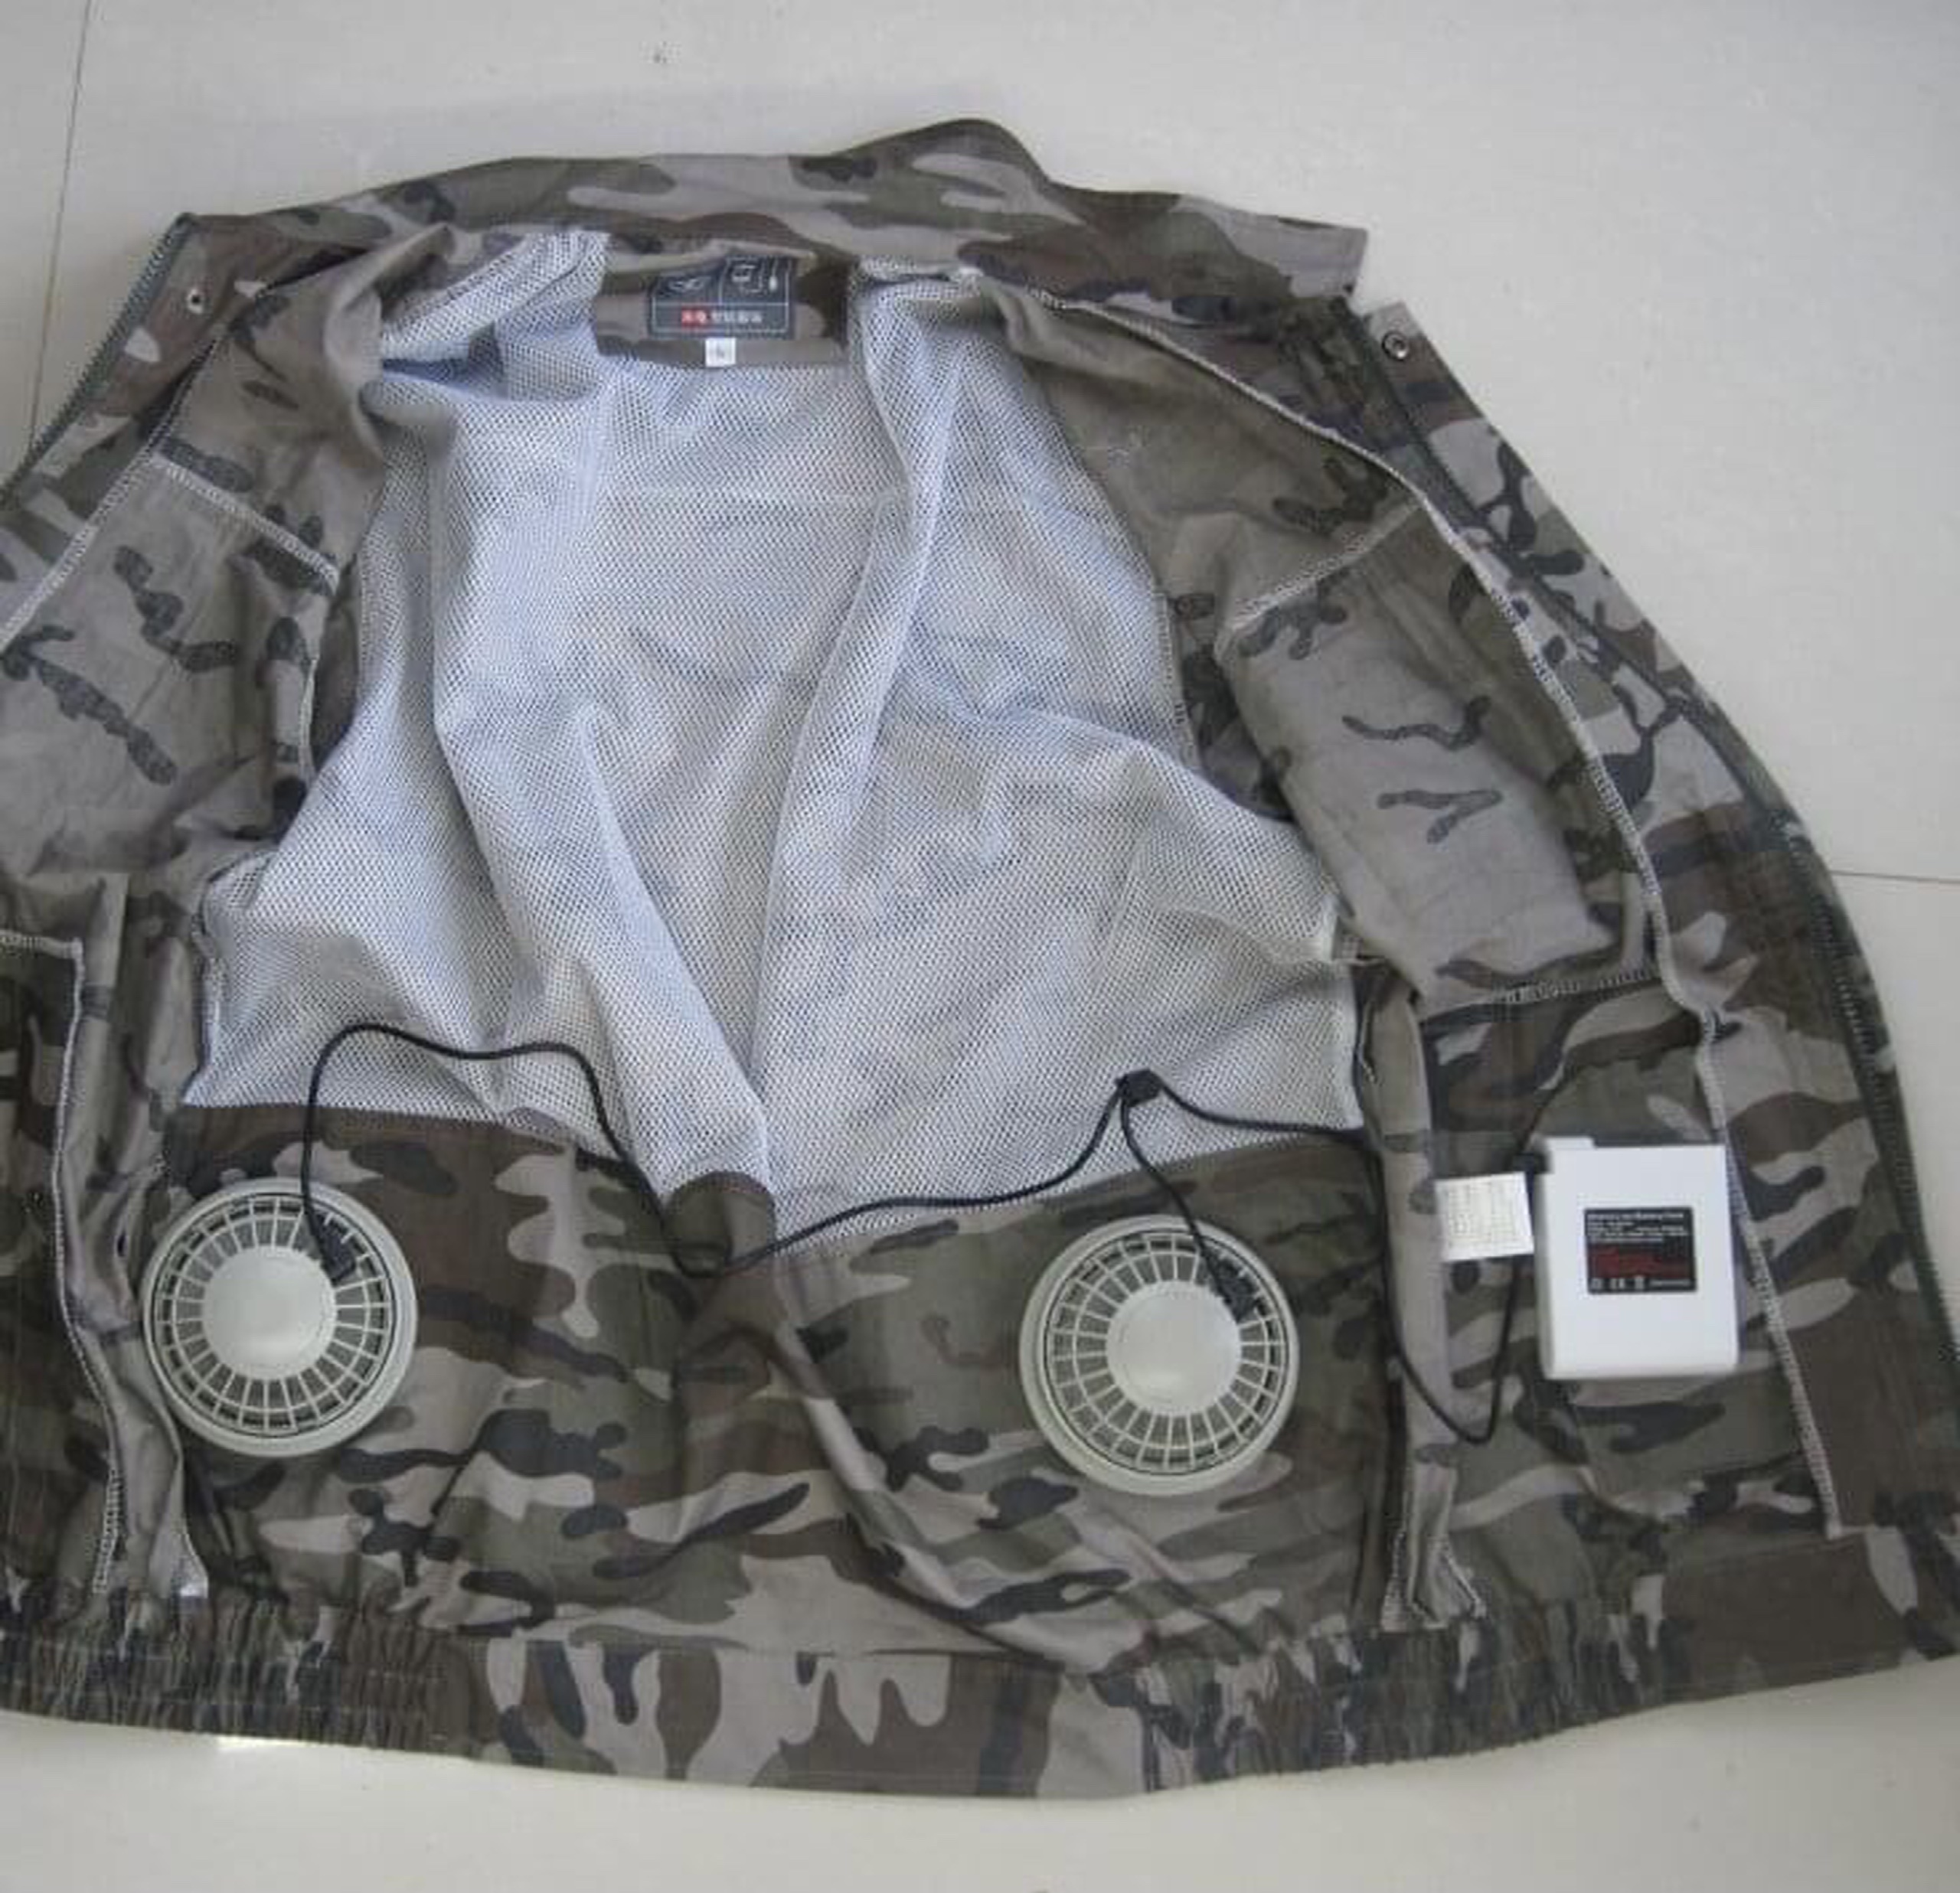 Bỏ tiền triệu mua áo gắn điều hòa